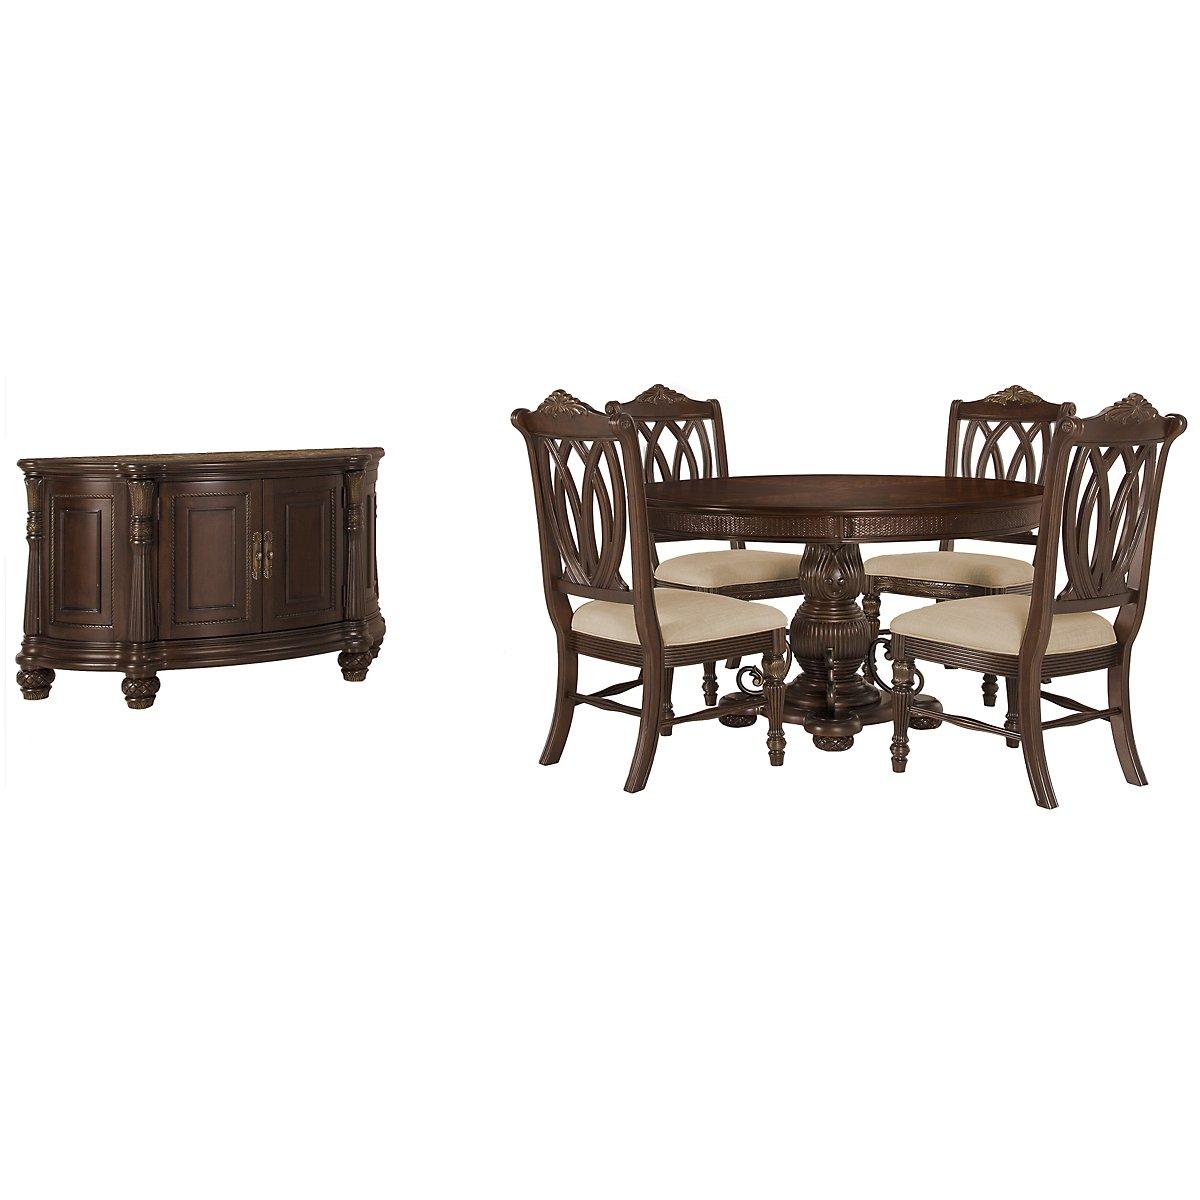 Tradewinds Dark Tone Round Dining Room